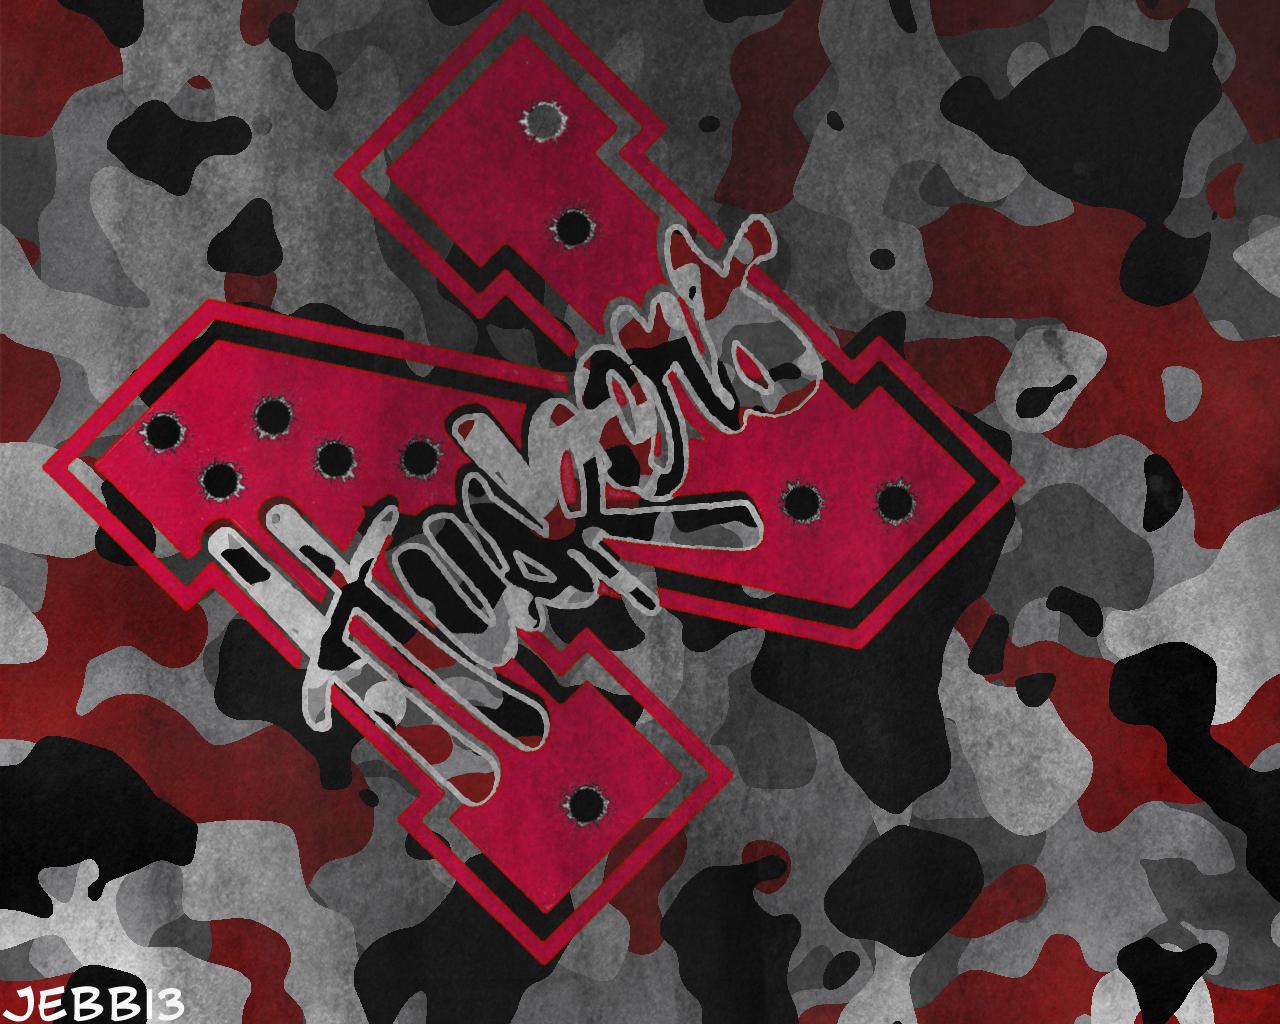 nebraska cornhuskers images camoflauge n hd wallpaper and